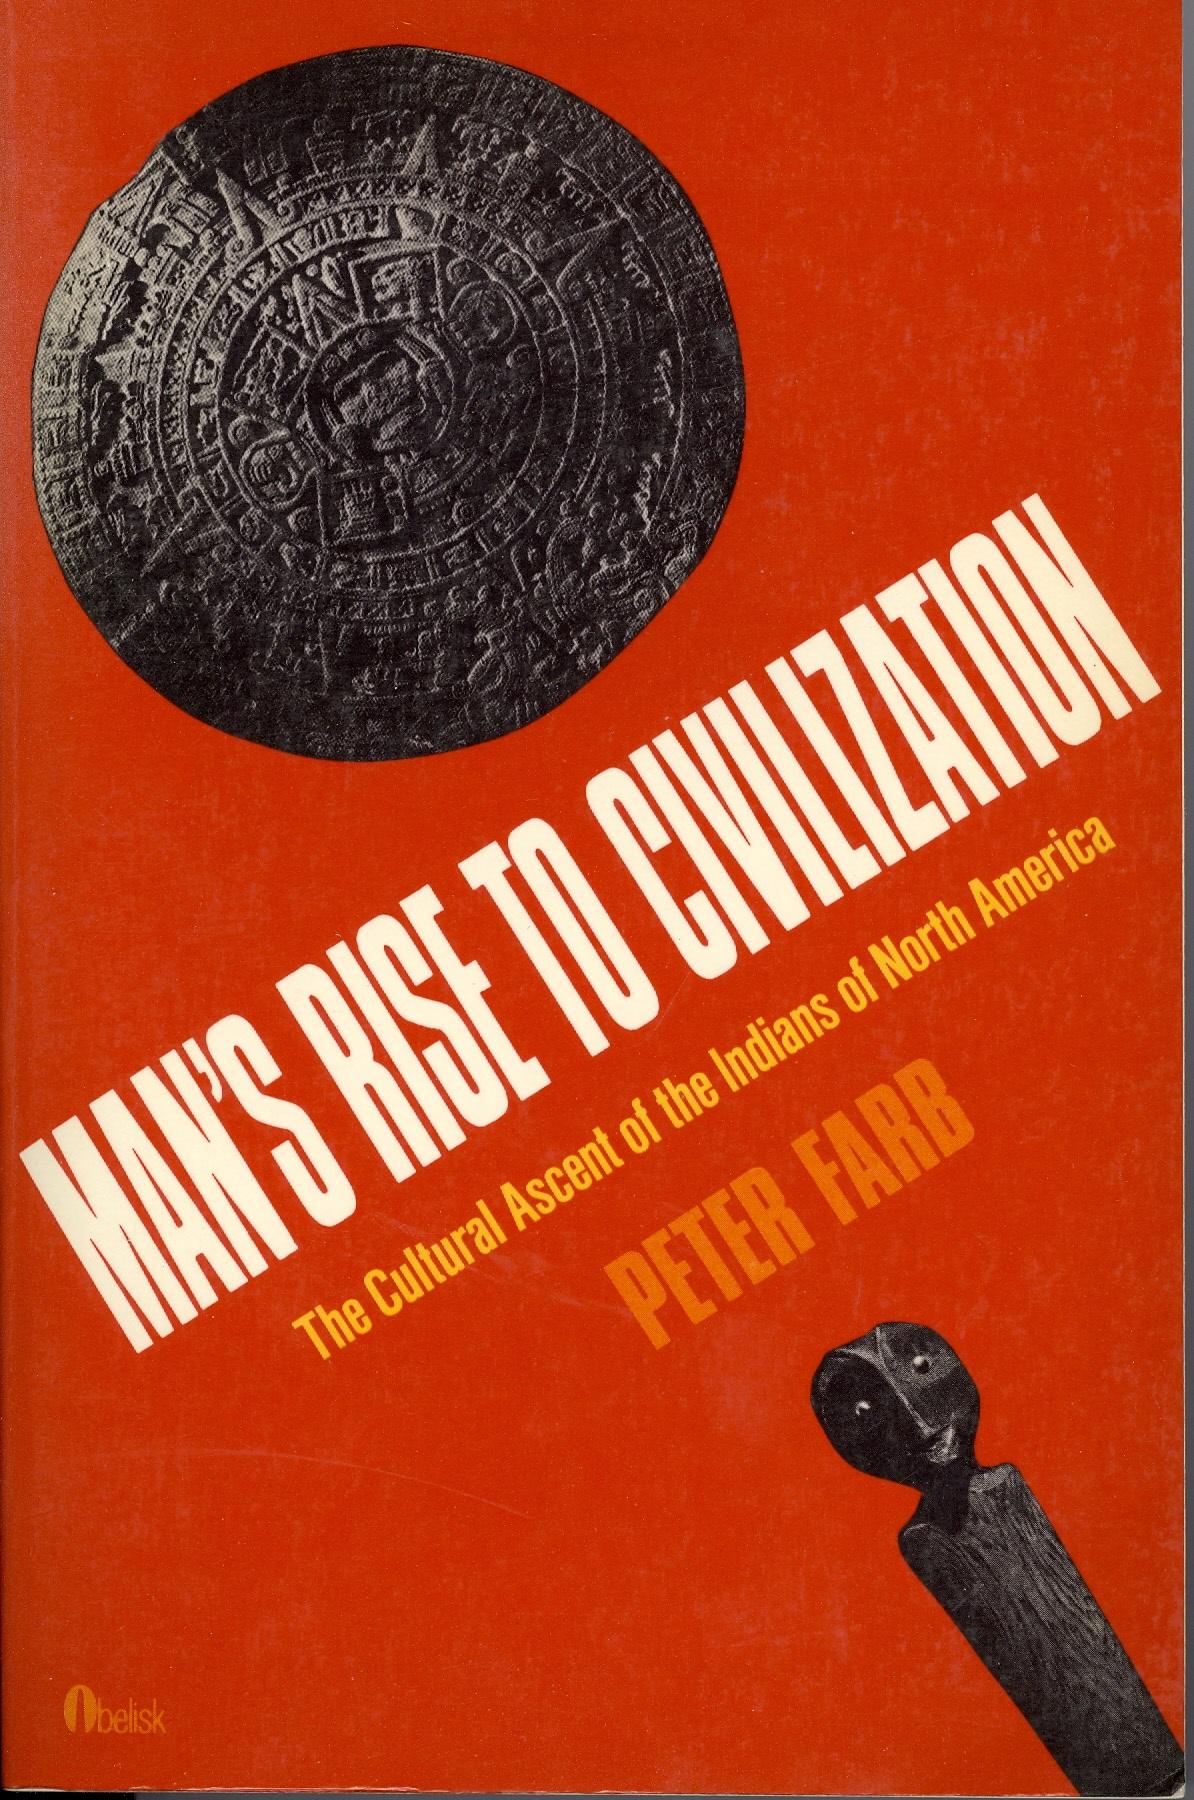 Man's rise to civilization